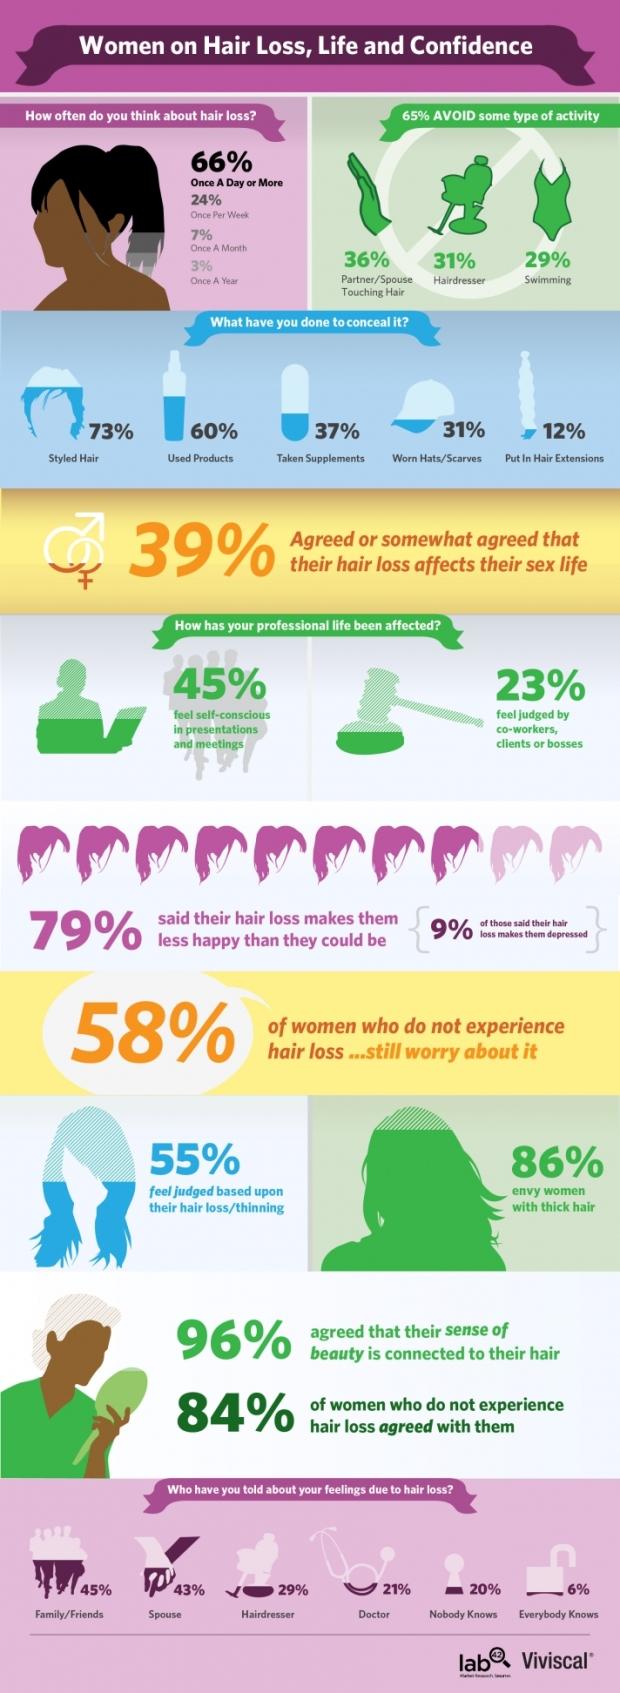 viviscal-hair-loss-infographic